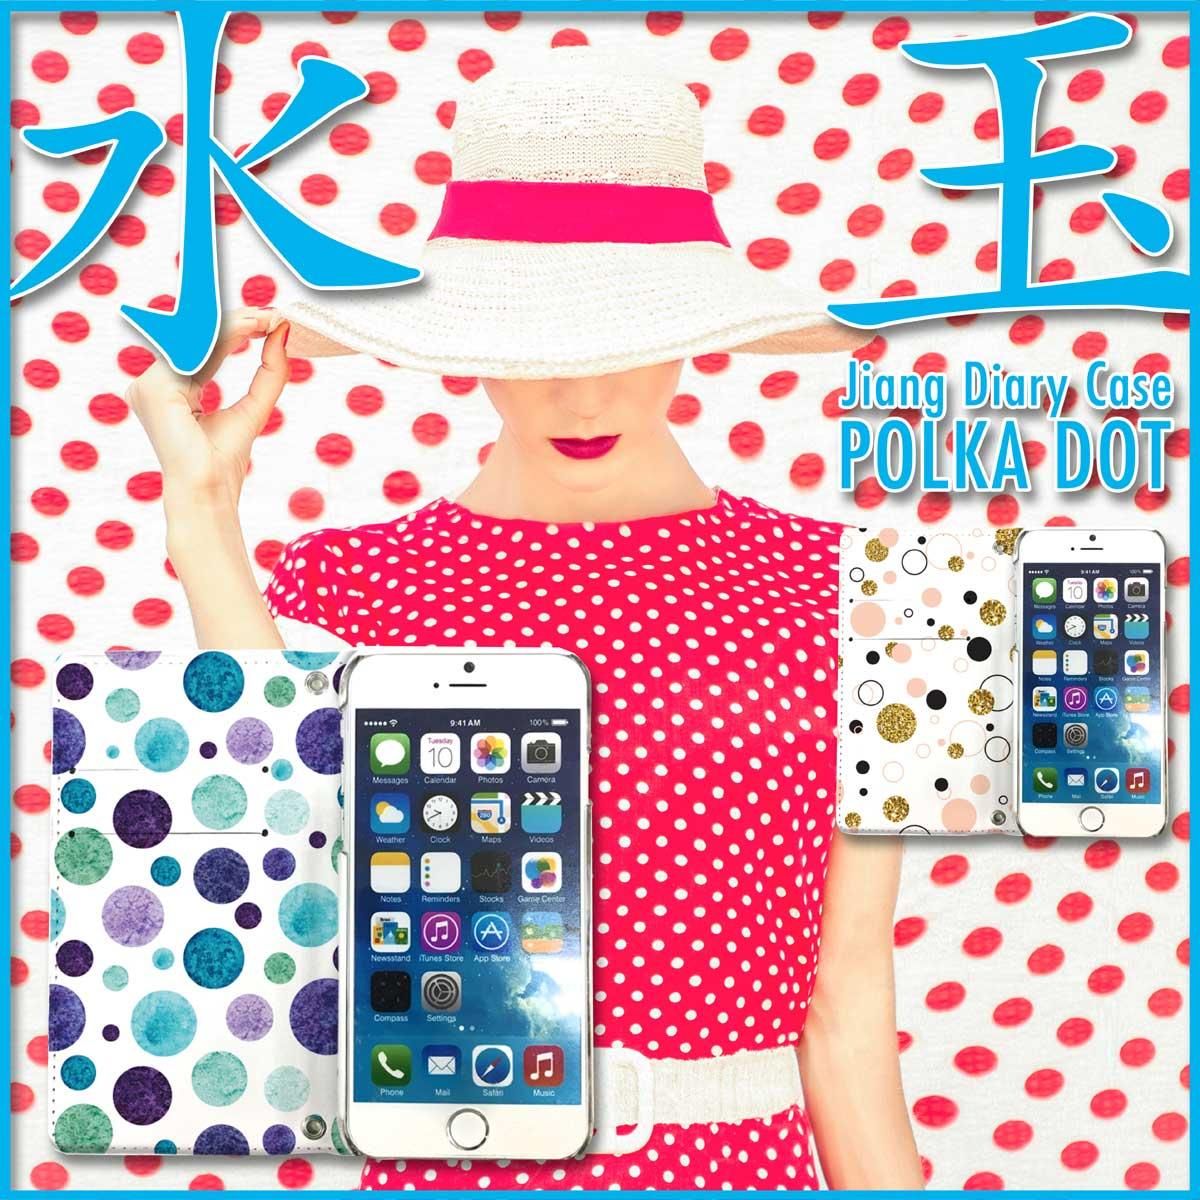 iPhoneケース iPhone7ケース iPhone7plus ケース スマホケース 手帳型 全機種対応 ベルトなし 手帳型ケース アイフォン7 ケース 可愛い カバー iPhone7 iPhone6s iPhone6 Plus Xperia XZ SO-02J aquos phone arrows かわいい 水玉 jiang-ds816